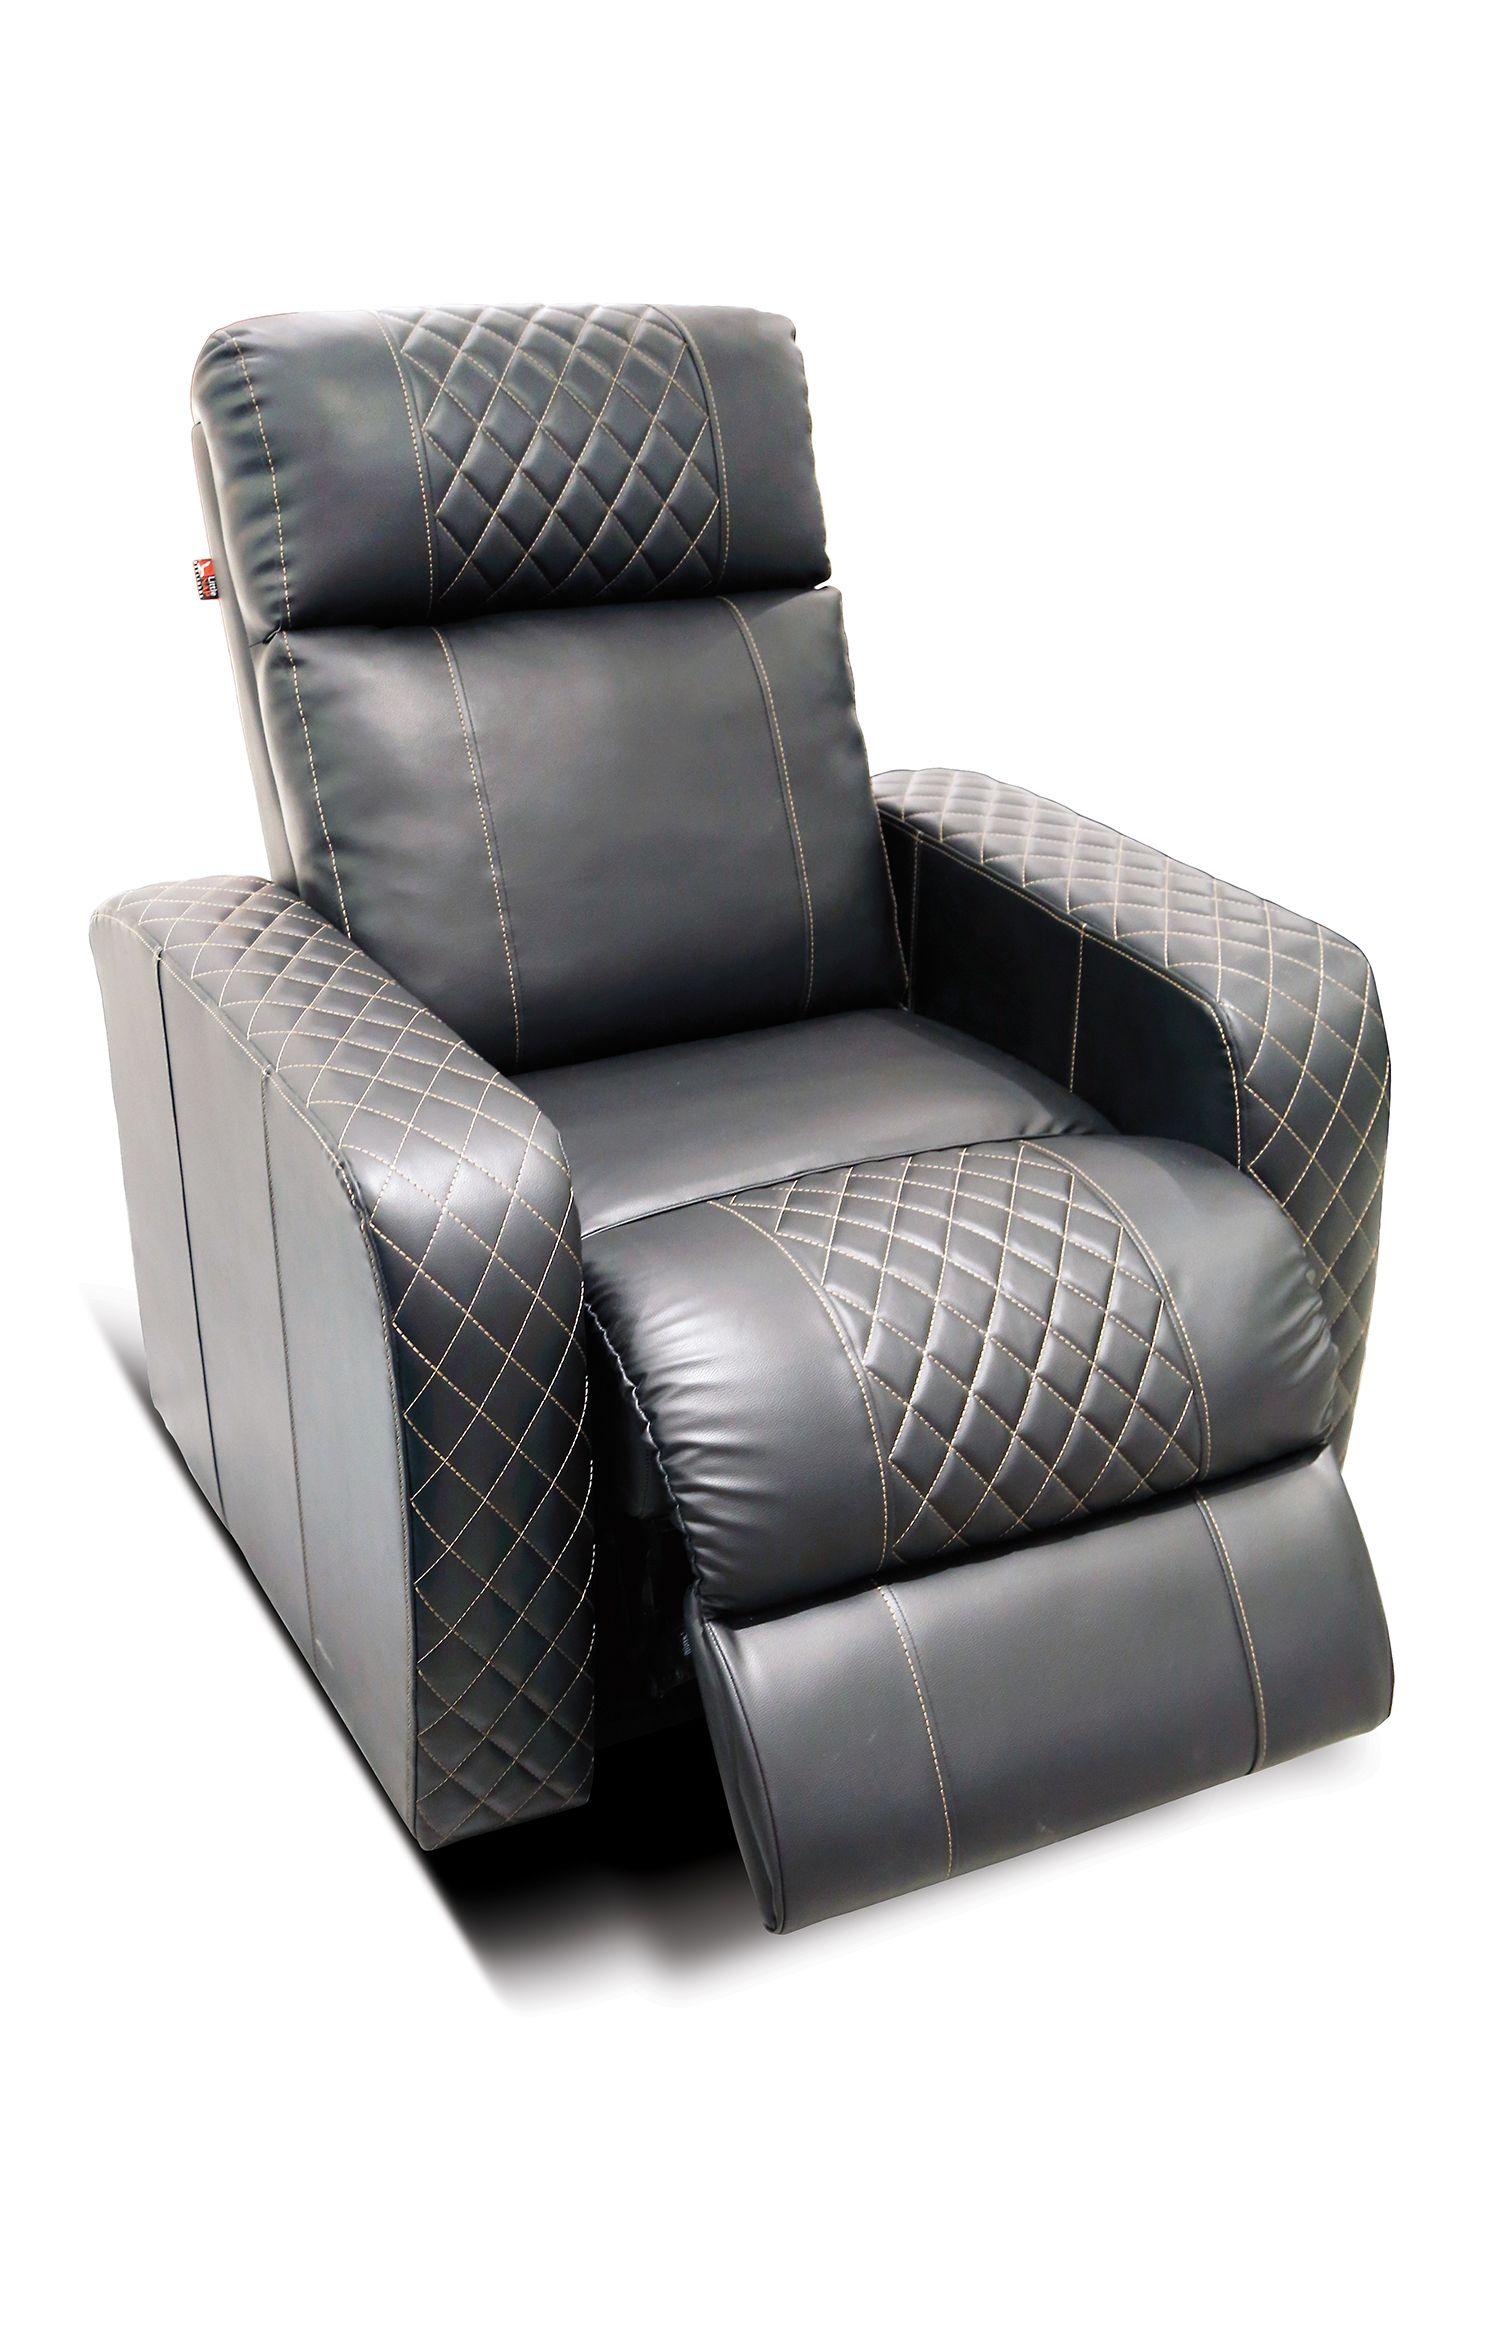 Little Nap Designs Provide Comfortable Home Theatre Recliners In Gurgaon Noida Bangalore Across All Over India Sofa Set Online Sofa Set Reclining Sofa